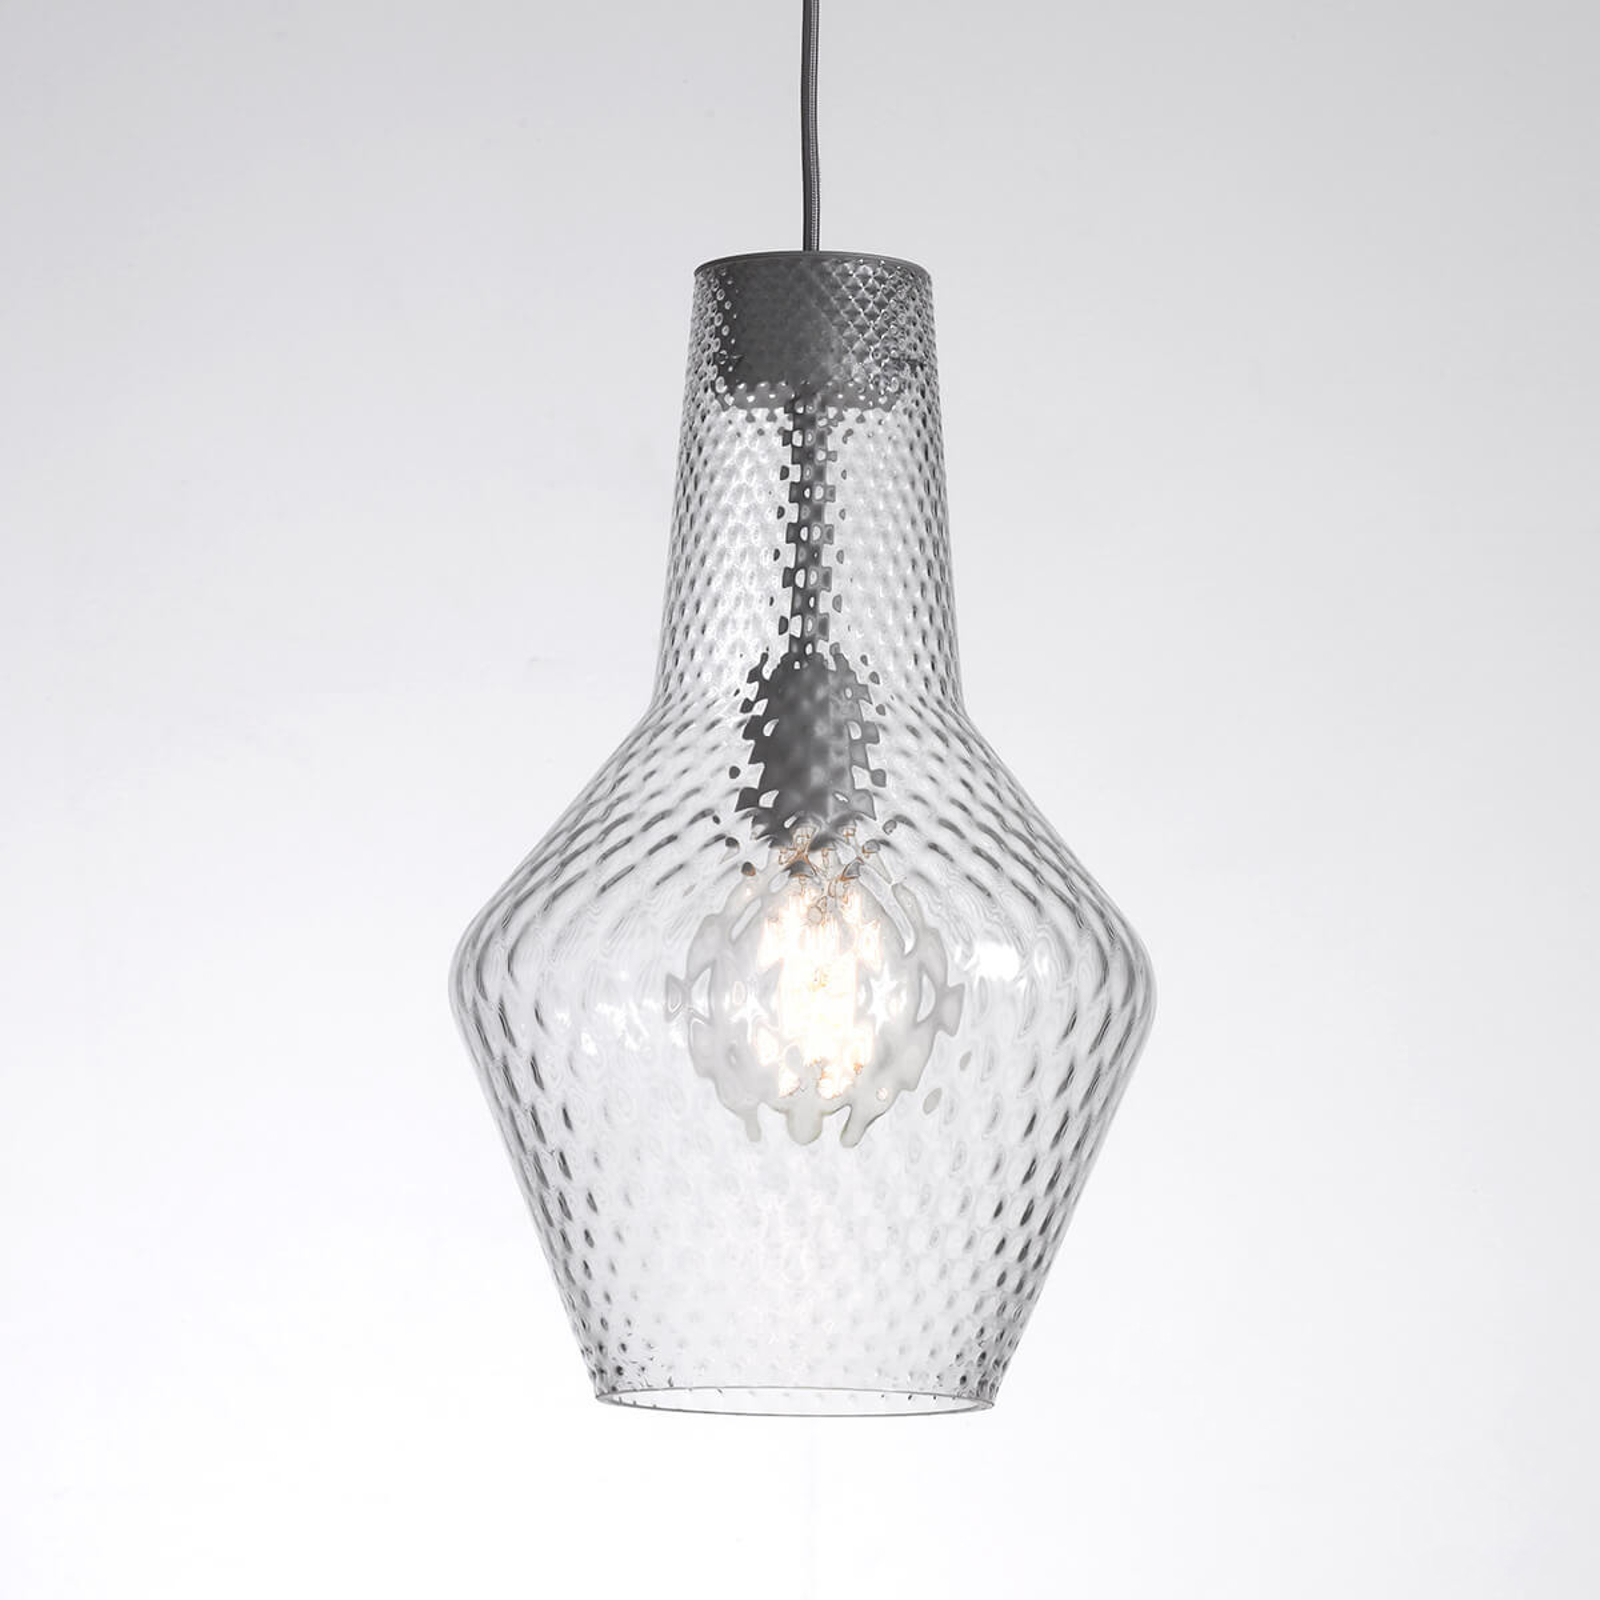 Hängeleuchte Romeo 130 cm, Glas transparent